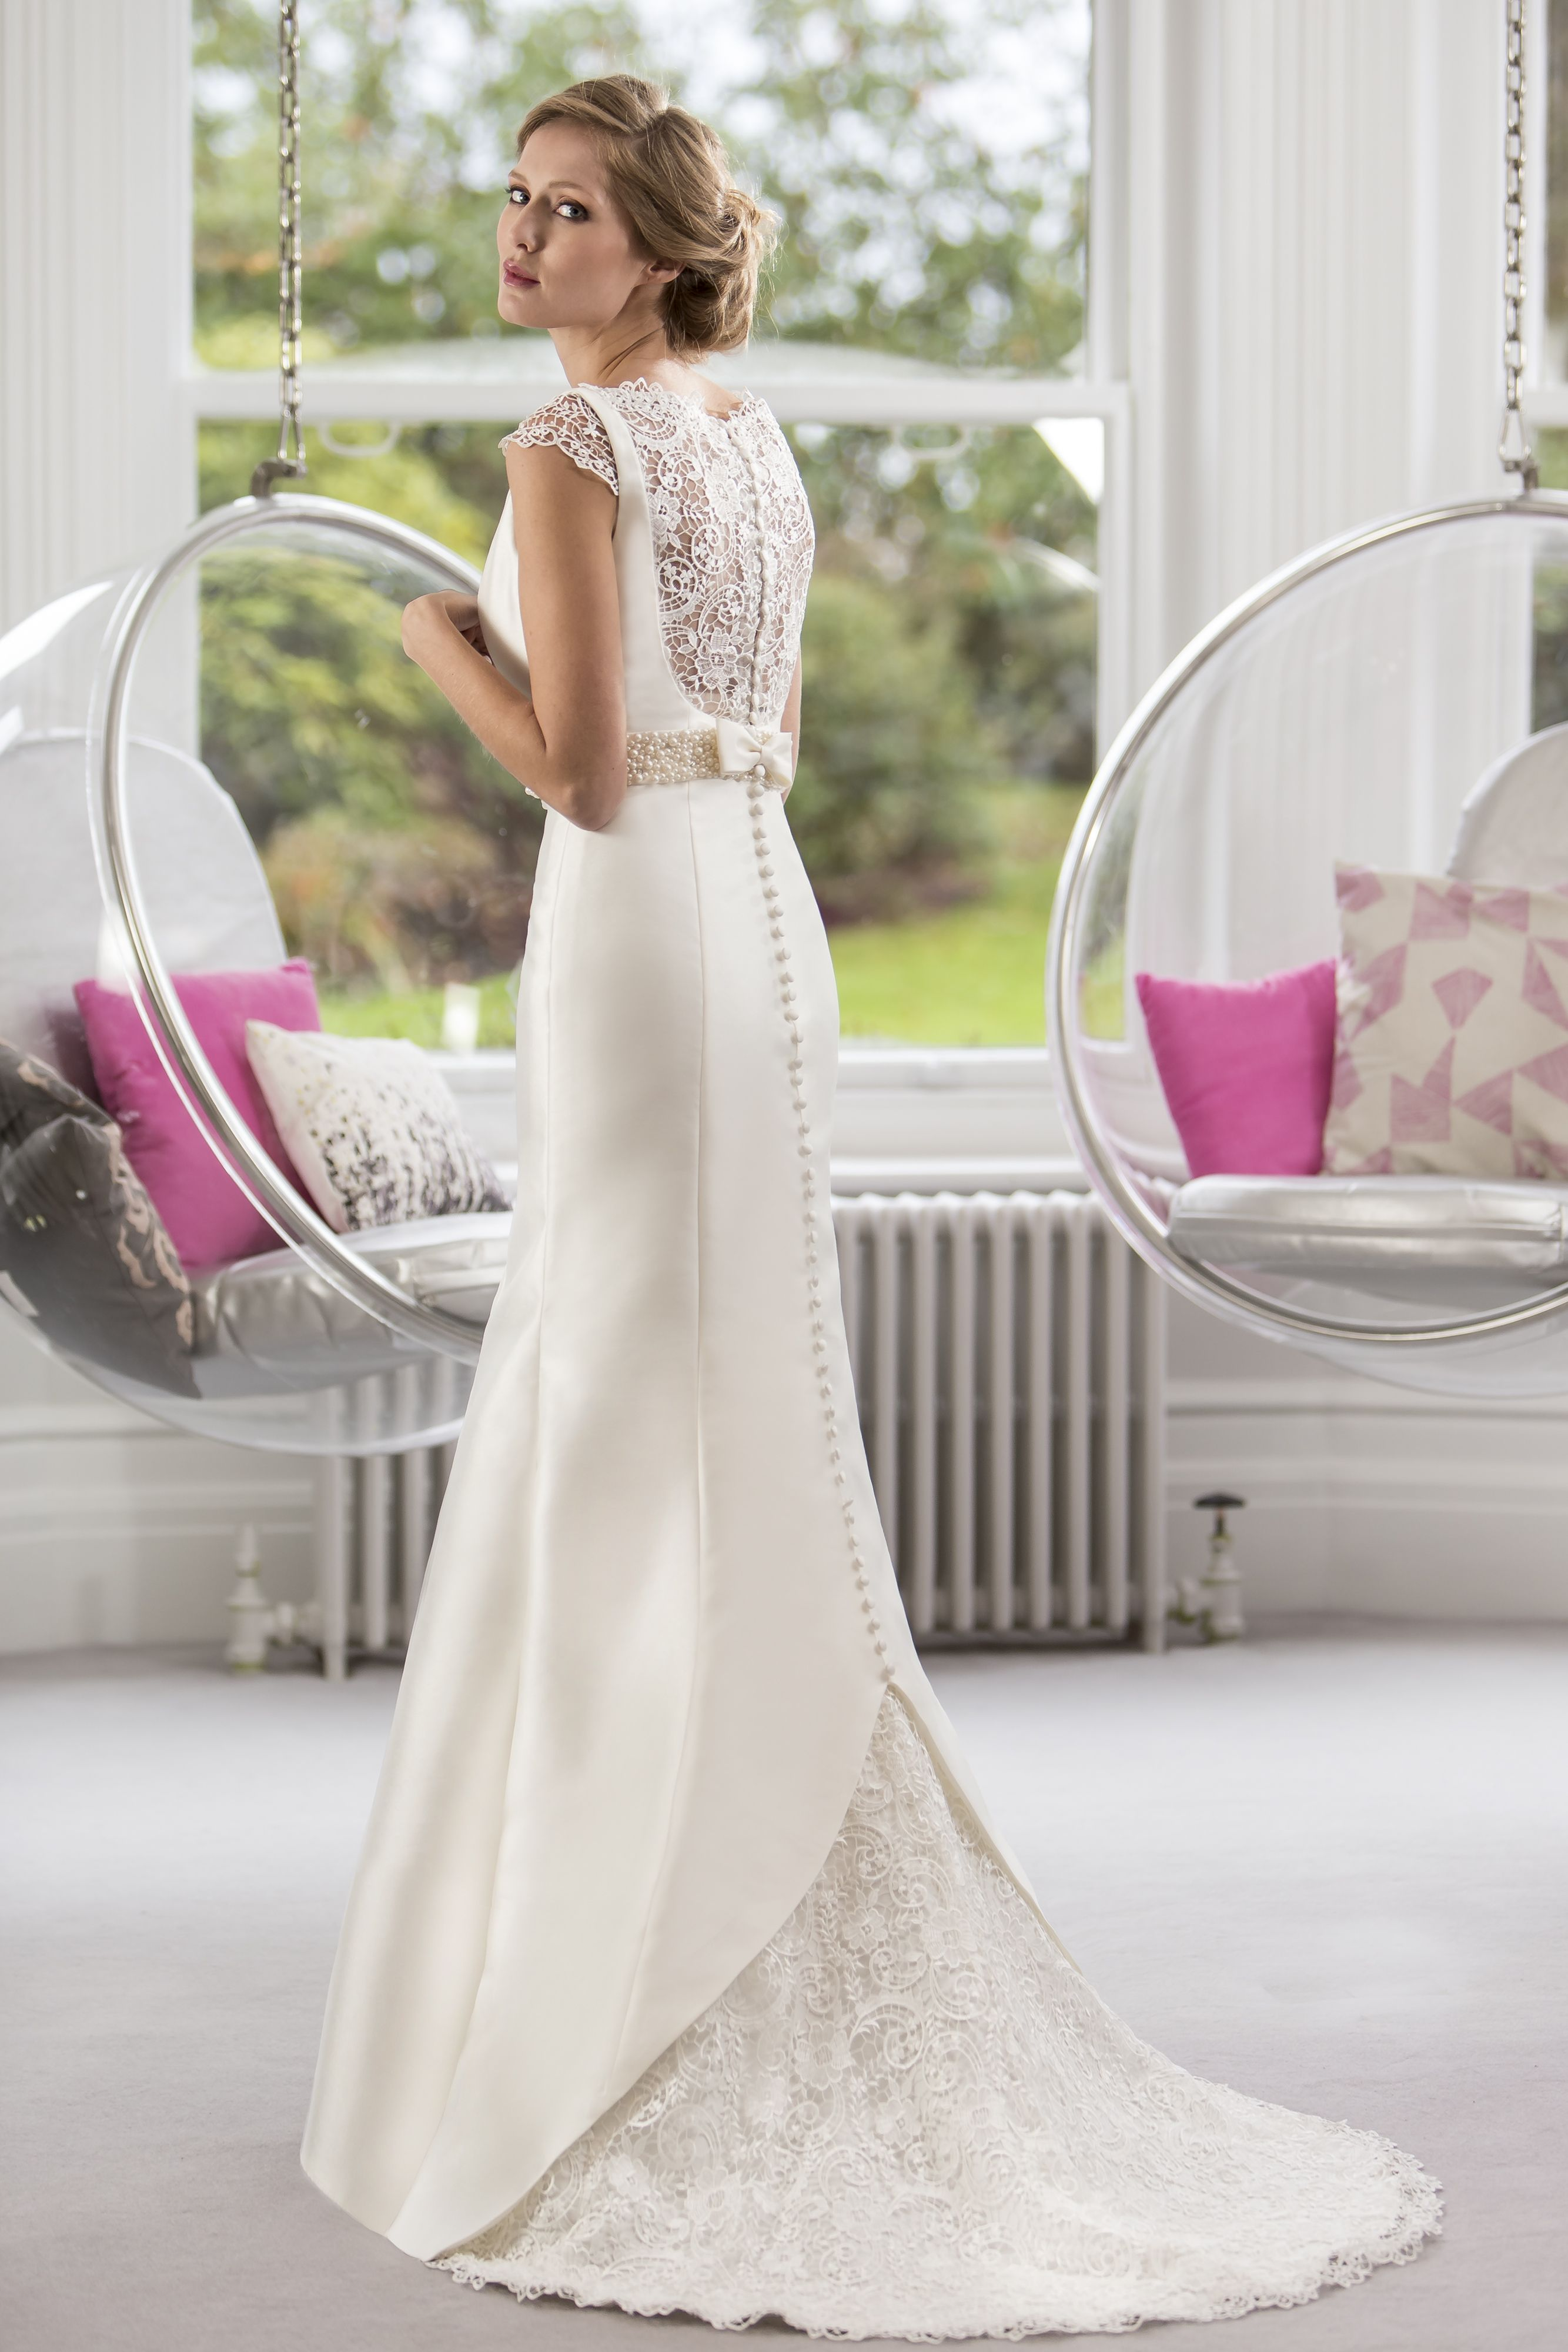 21+ Slim fit wedding dress with train ideas in 2021